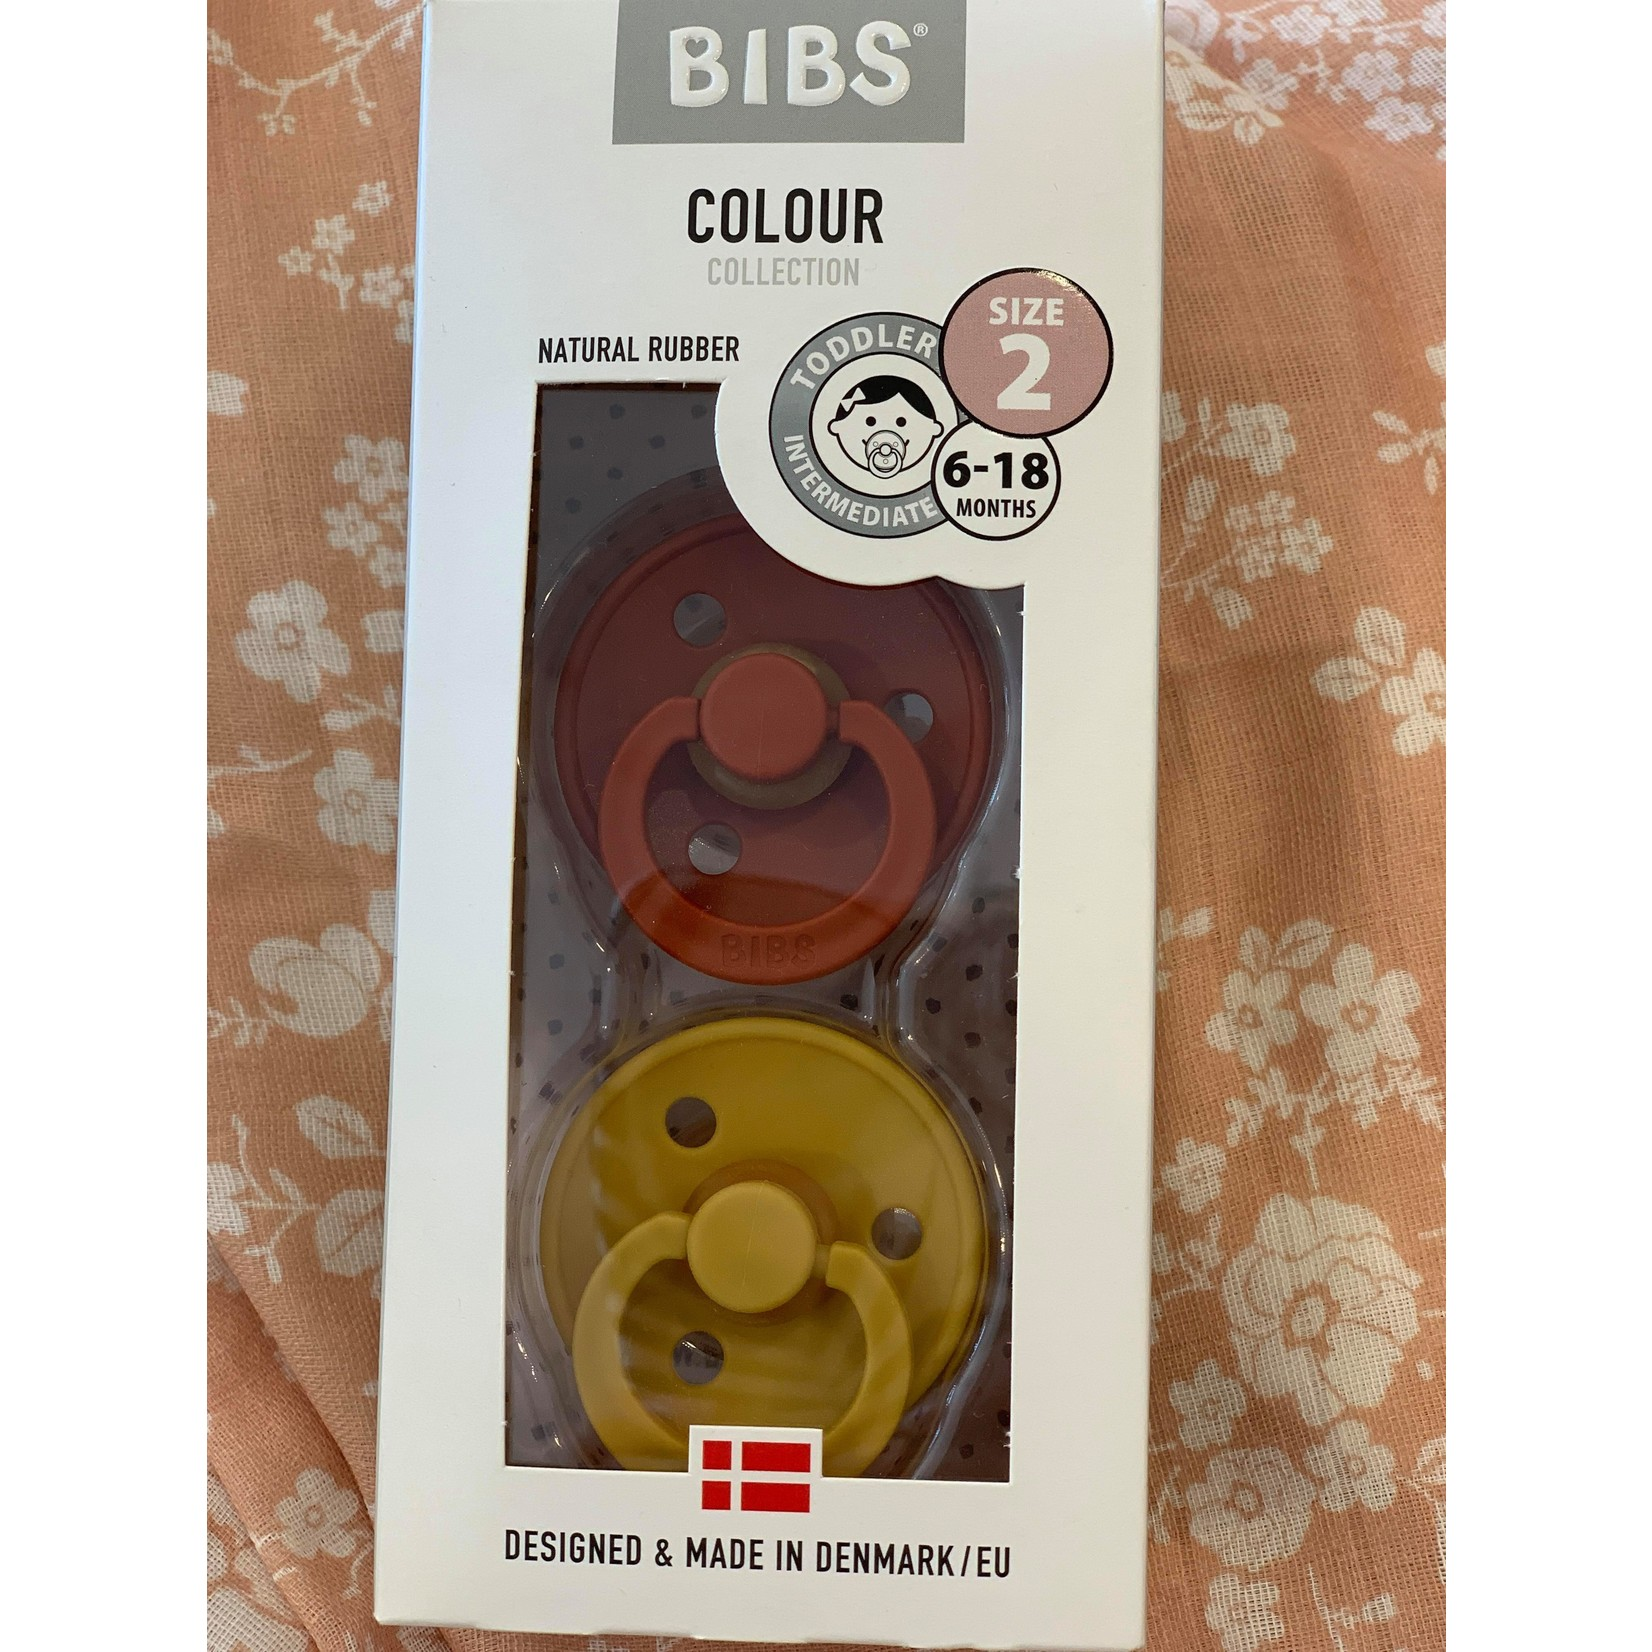 Bibs || Bibs Rouille/ Moutard 6-18 mois